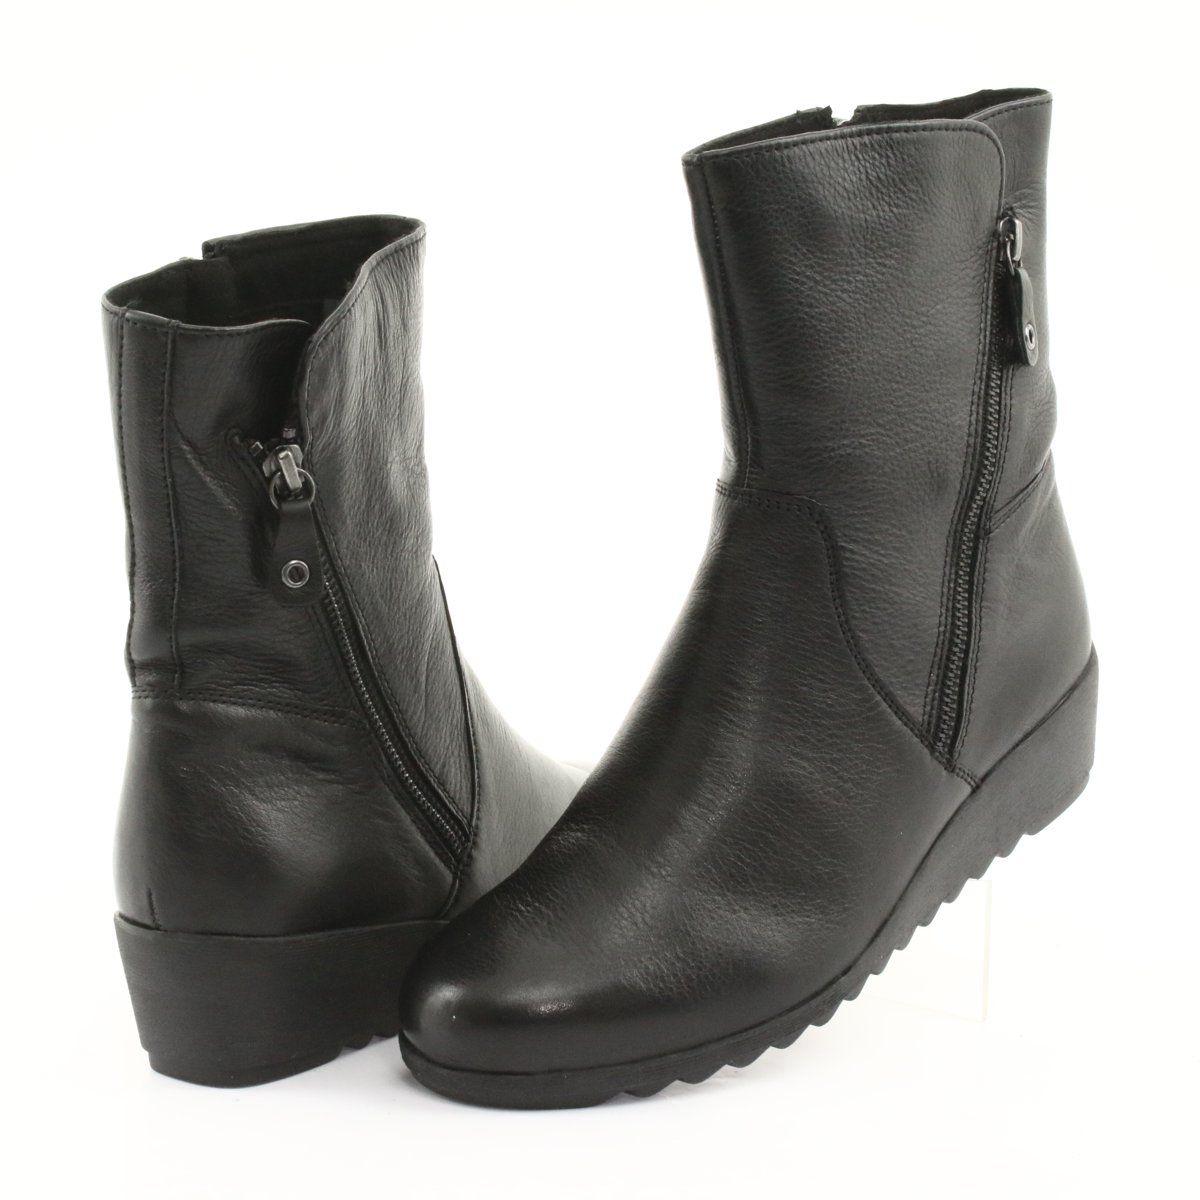 Caprice Botki Na Koturnie Czarne Boots Black Wedge Shoes Womens Boots